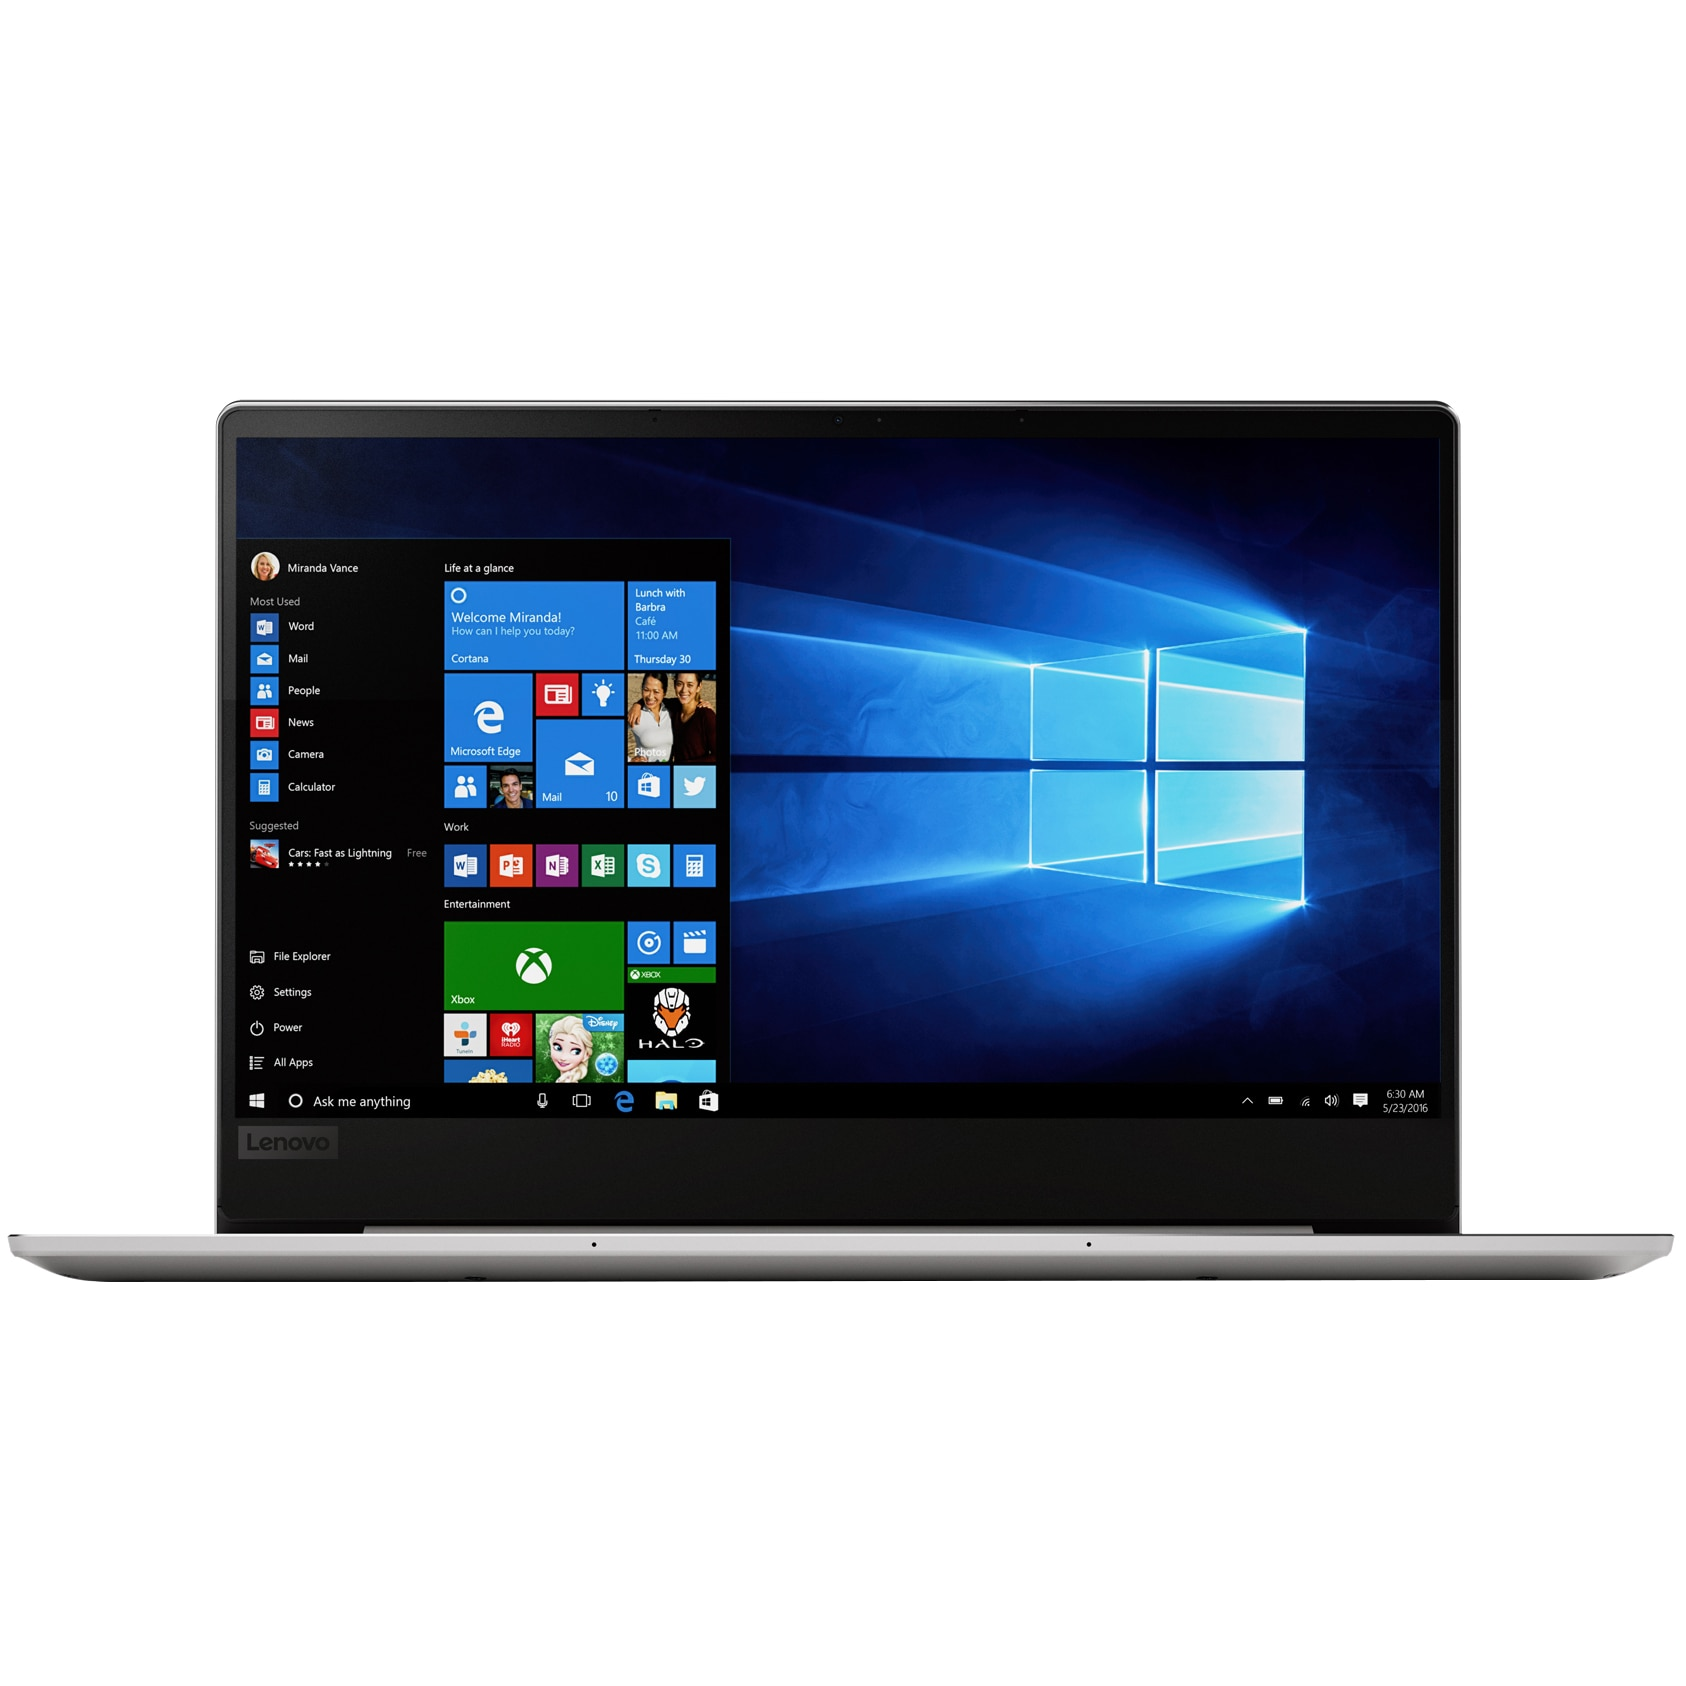 "Fotografie Laptop ultraportabil Lenovo IdeaPad 720S-13ARR cu procesor AMD Ryzen™ 7 2700U pana la 3.80 GHz, 13.3"", Full HD, IPS, 8GB, 256GB SSD, Radeon™ RX Vega 10 Graphics, Microsoft Windows 10, Platinum"